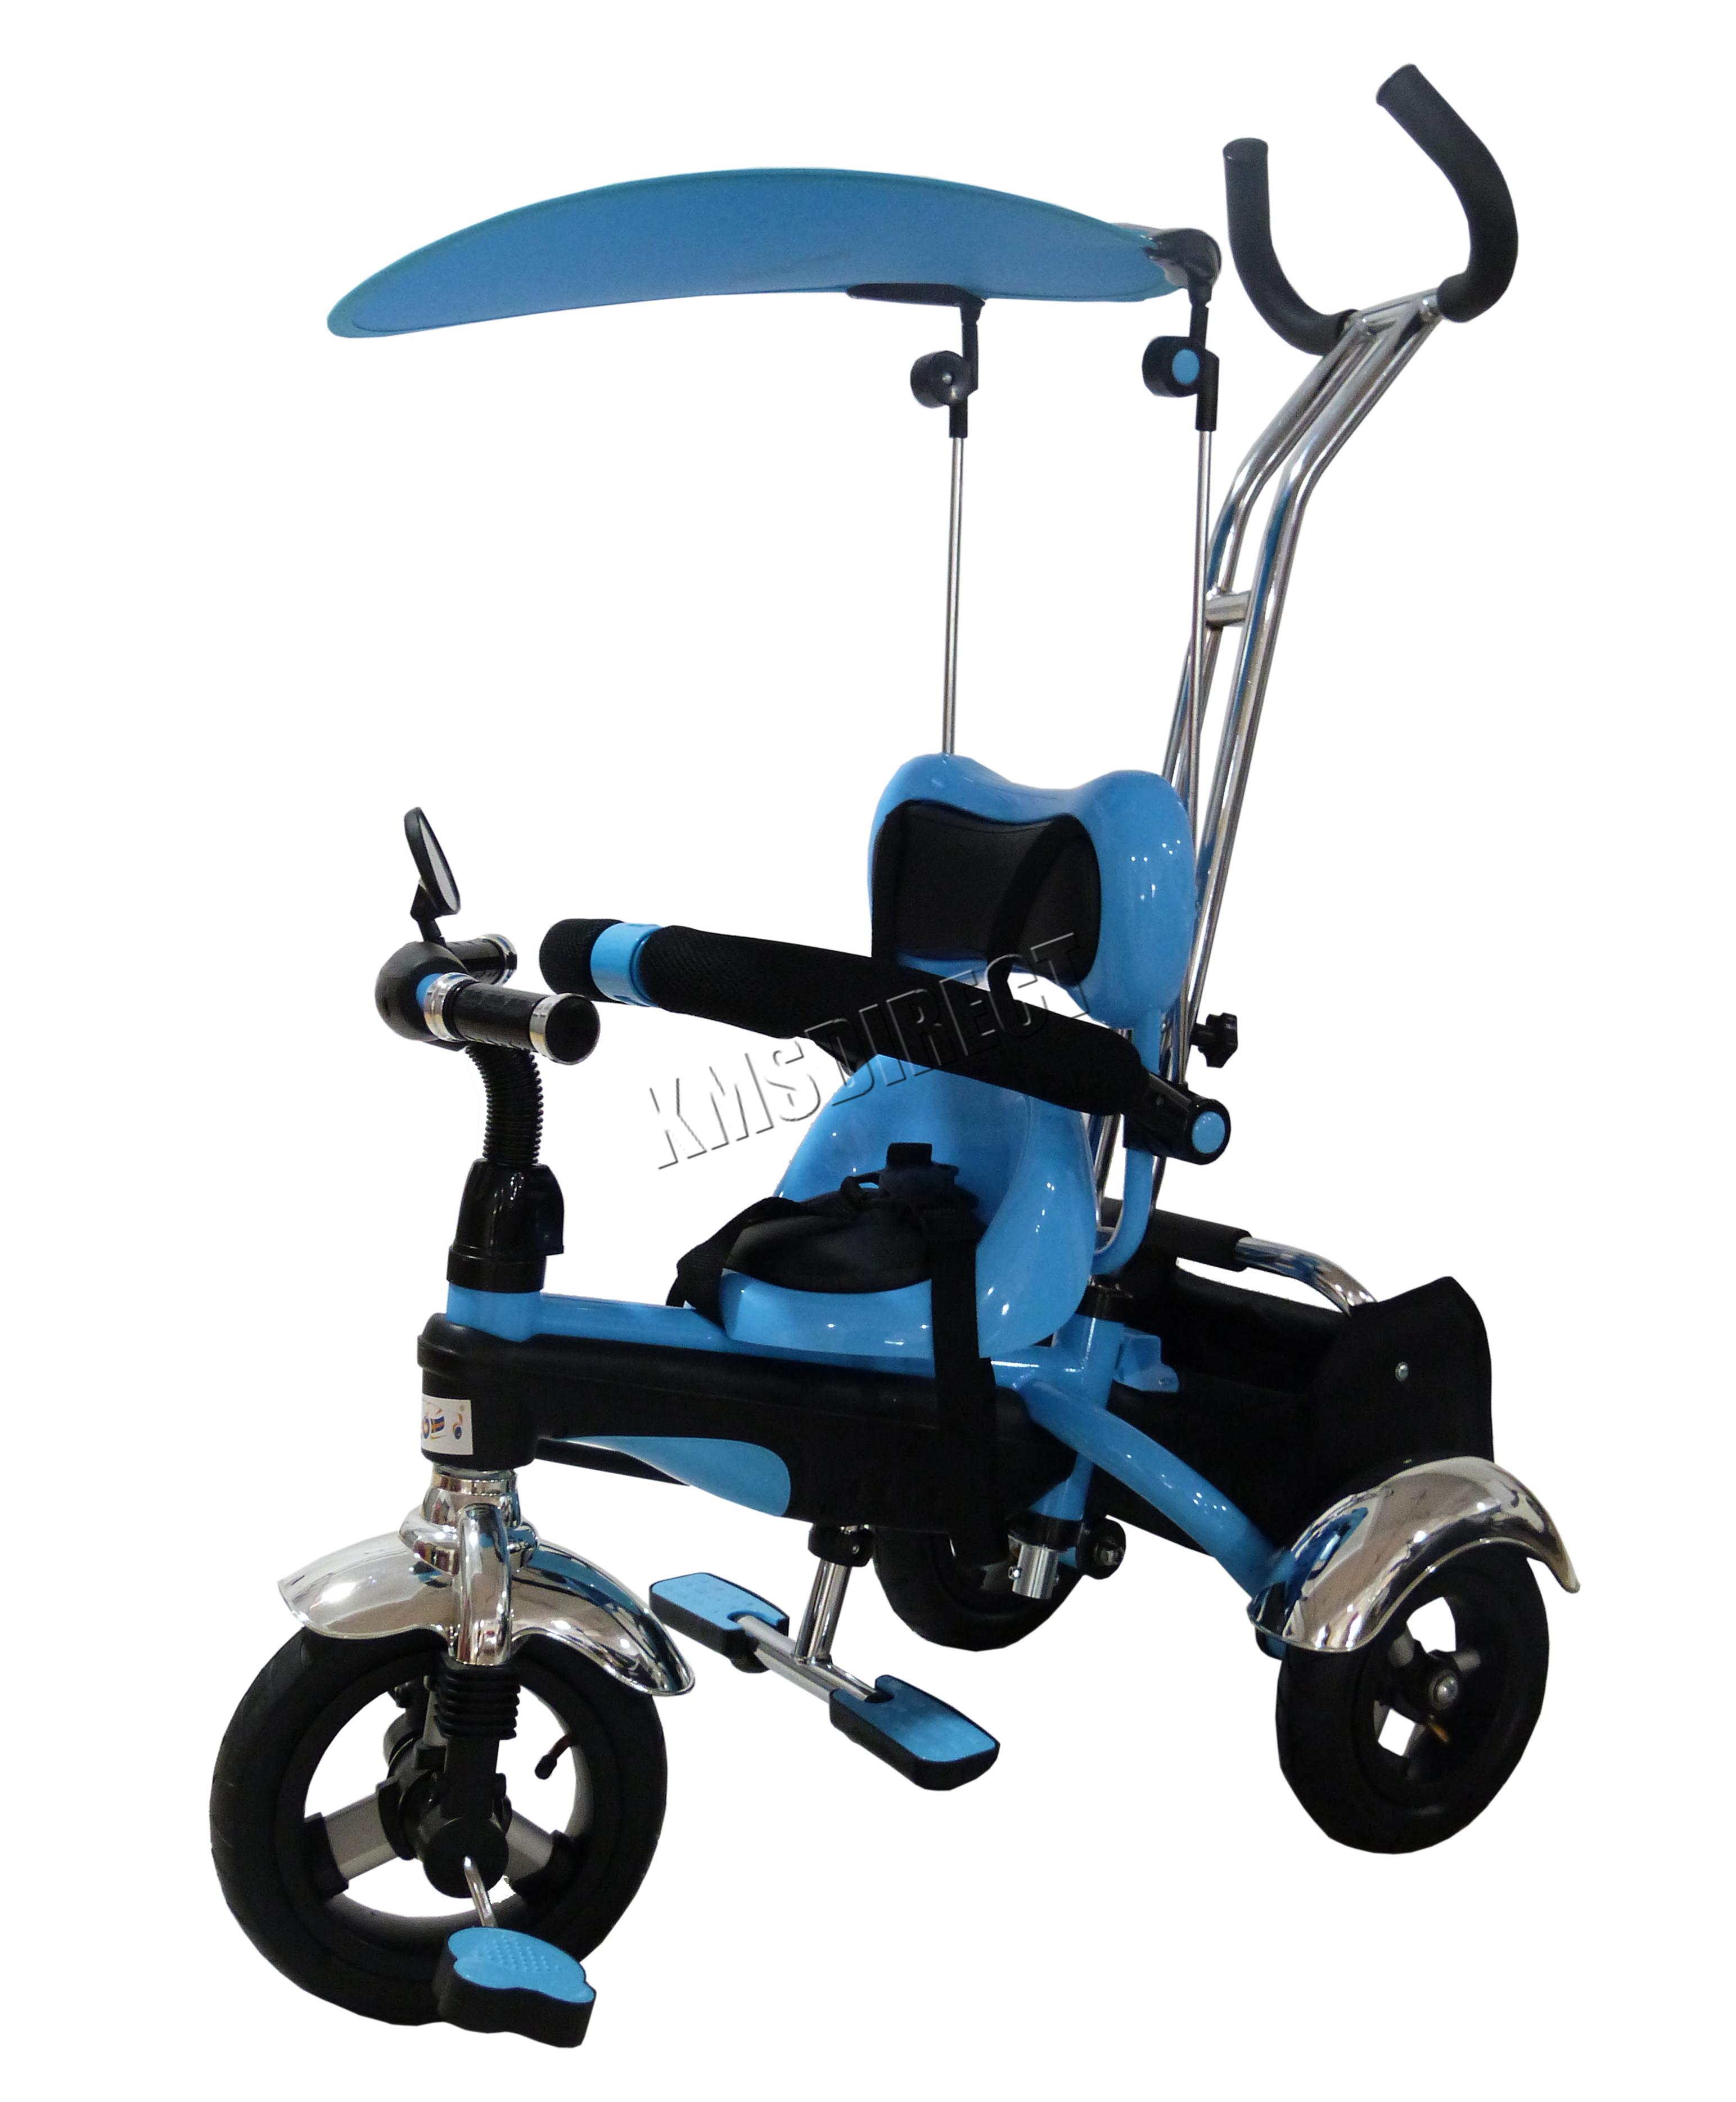 FoxHunter Children Trike Tricycle 3 Wheel 4in1 Ride Bike Parent ...